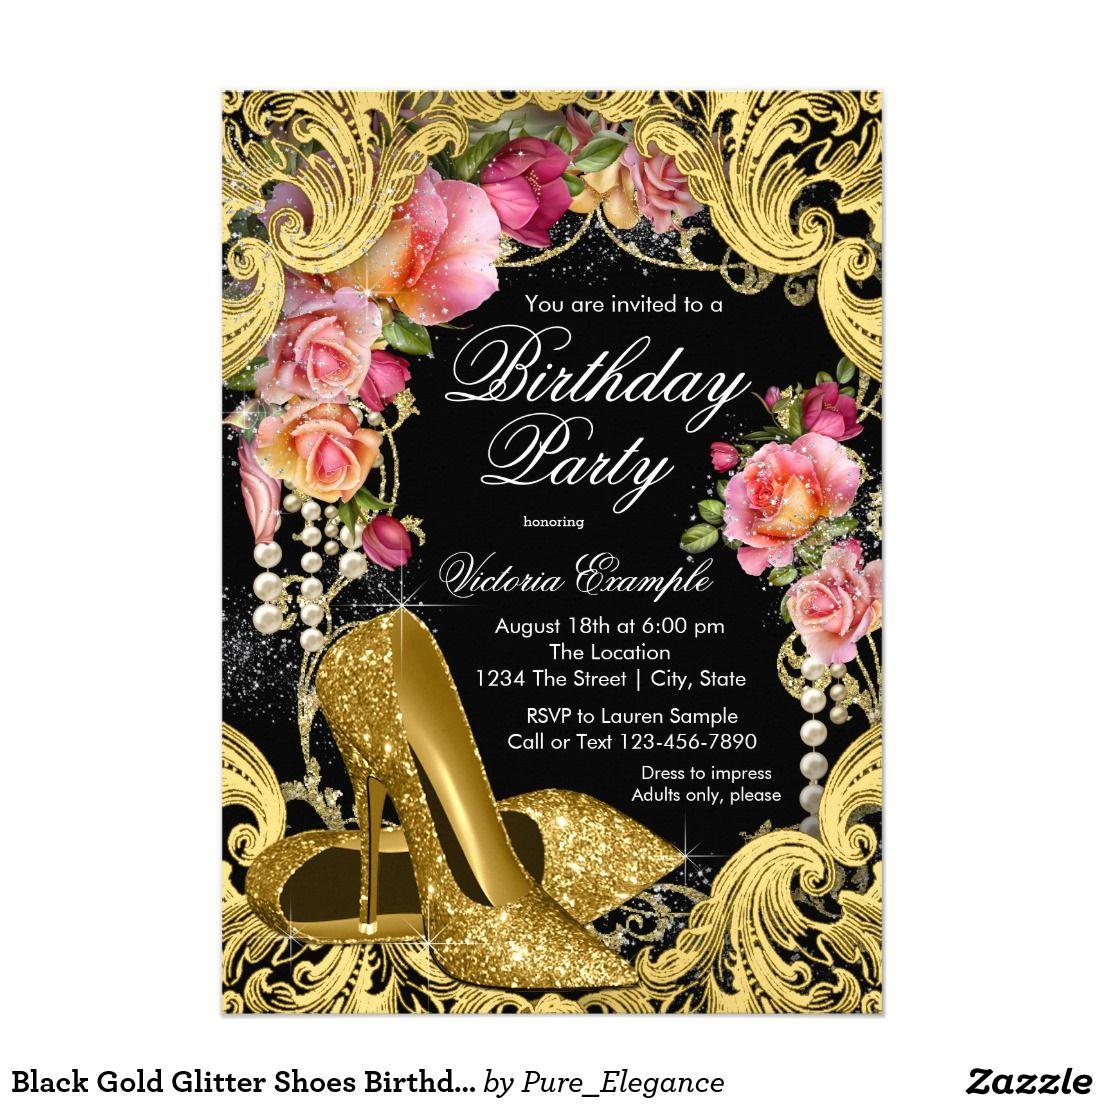 Black Gold Glitter Shoes Birthday Party Invitation | High Heels Shoe ...